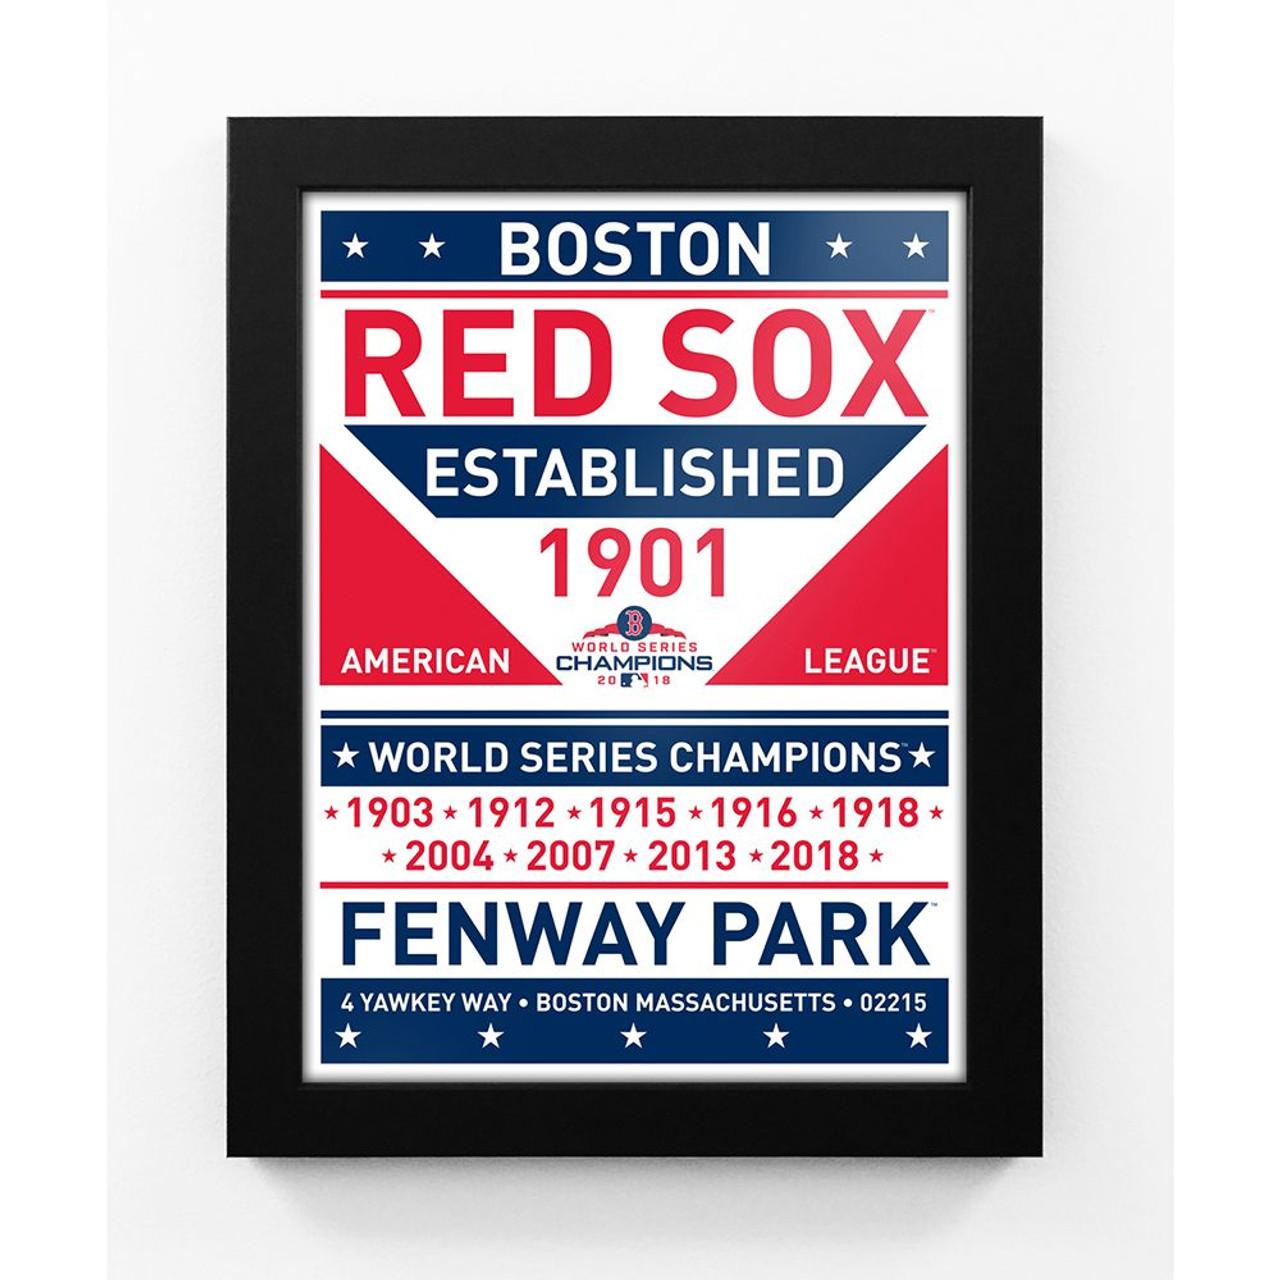 2018 World Series Champions Team Sign Framed Print - Boston Red Sox